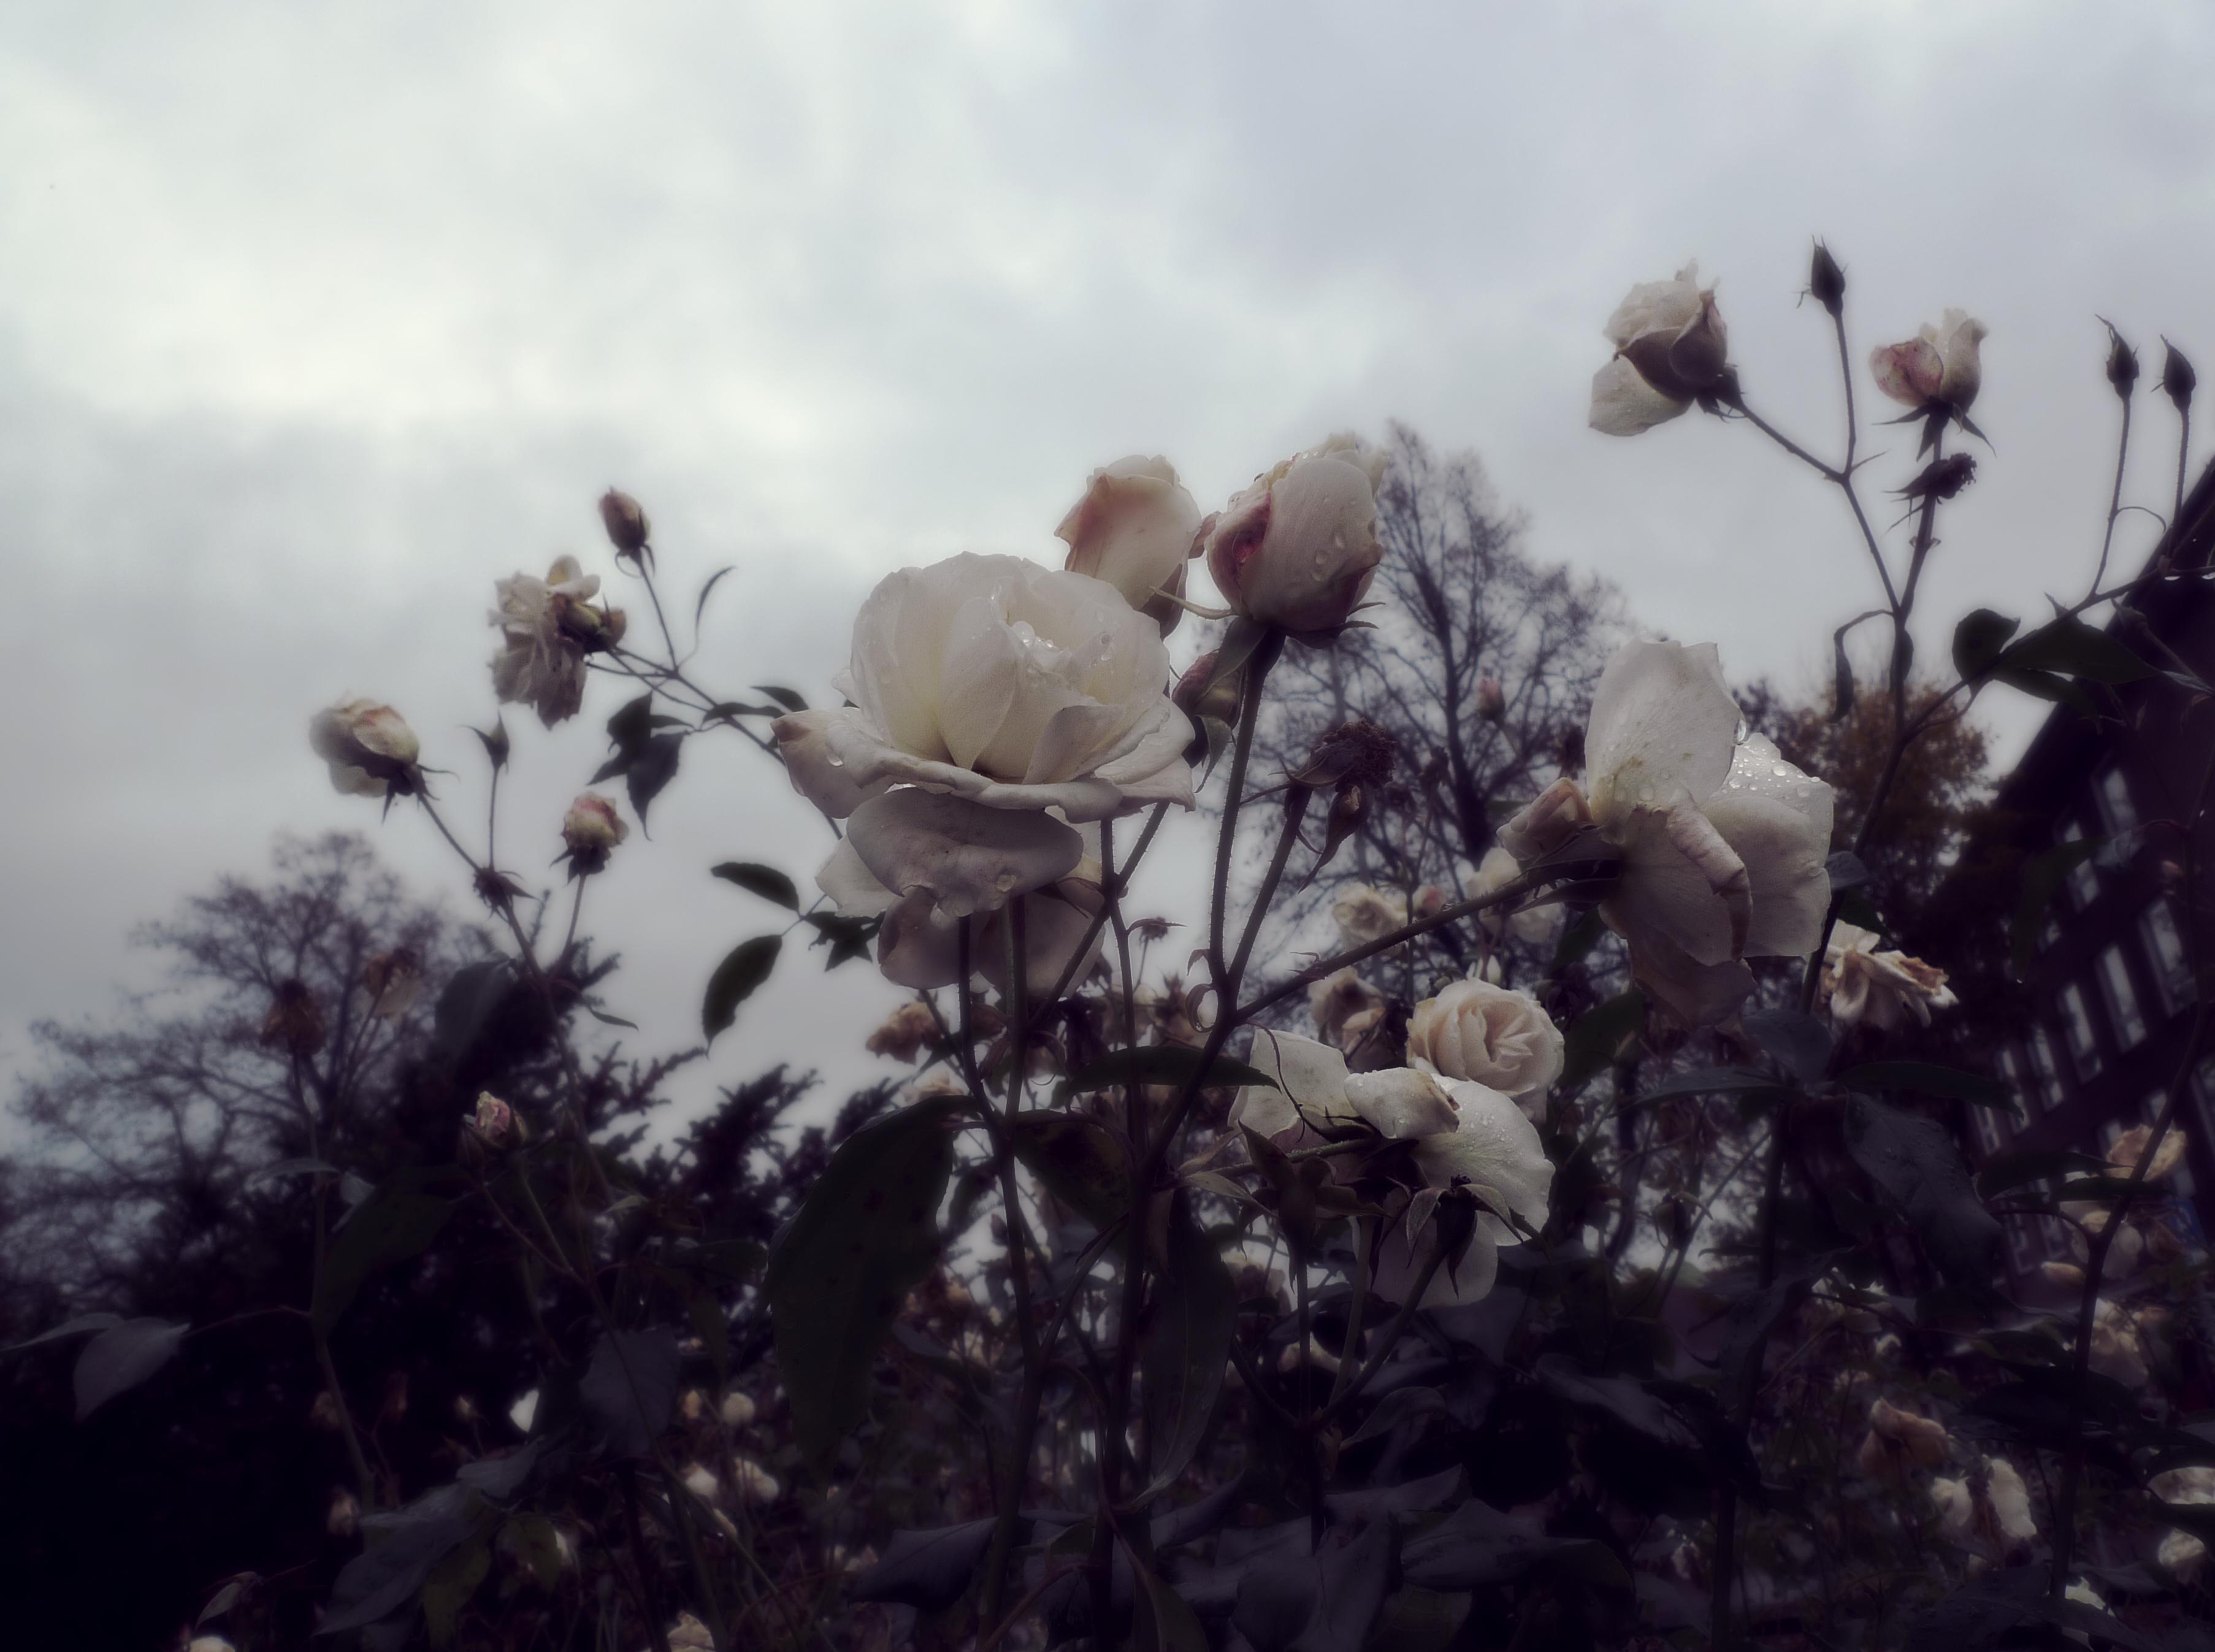 Dead Roses By Black Absinth